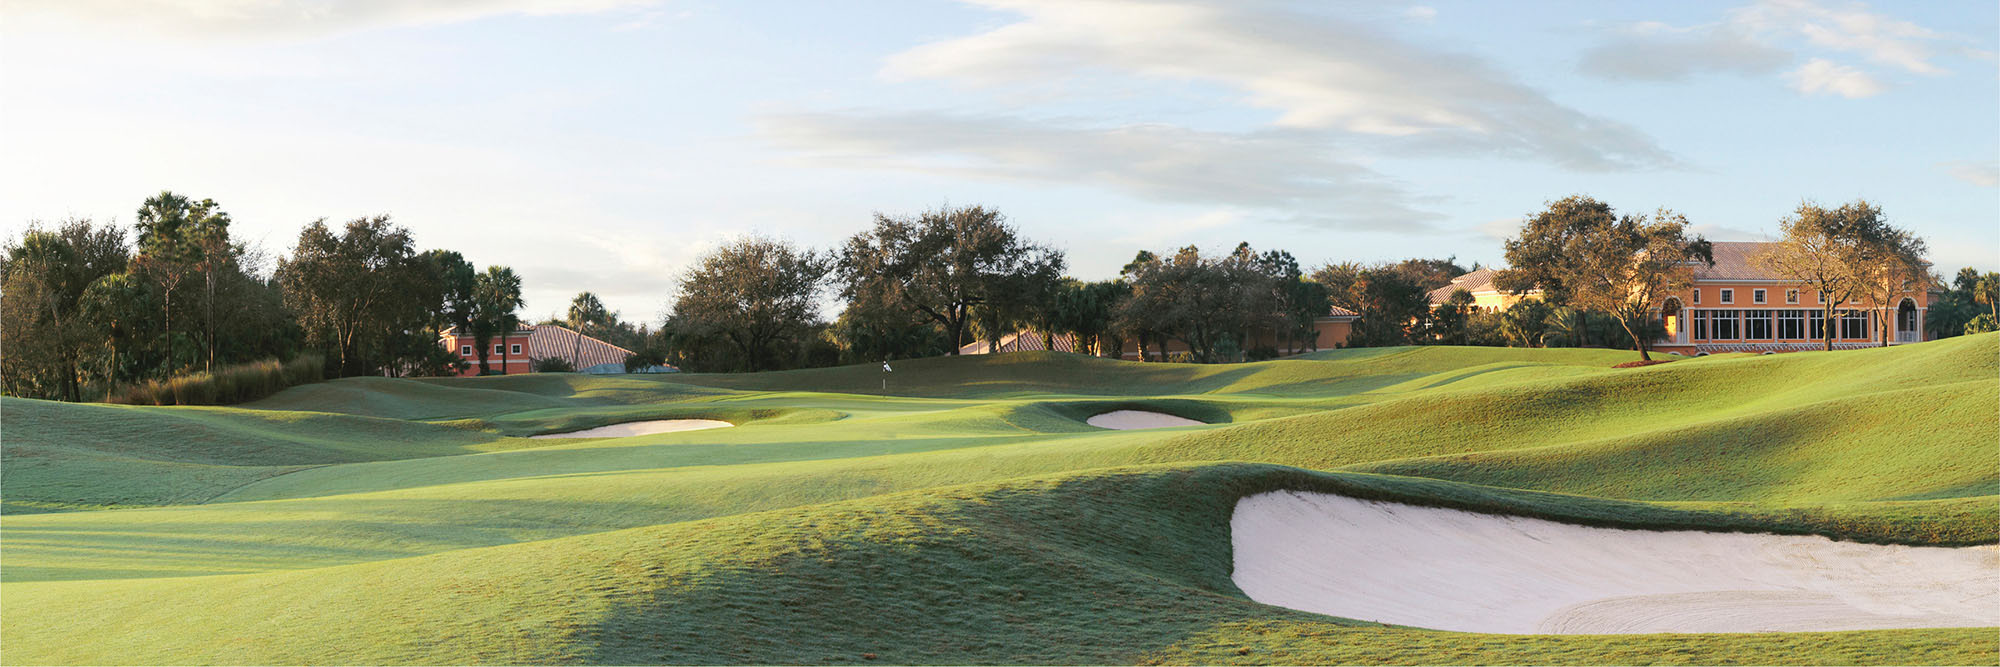 Golf Course Image - Mirasol Sunrise No. 18